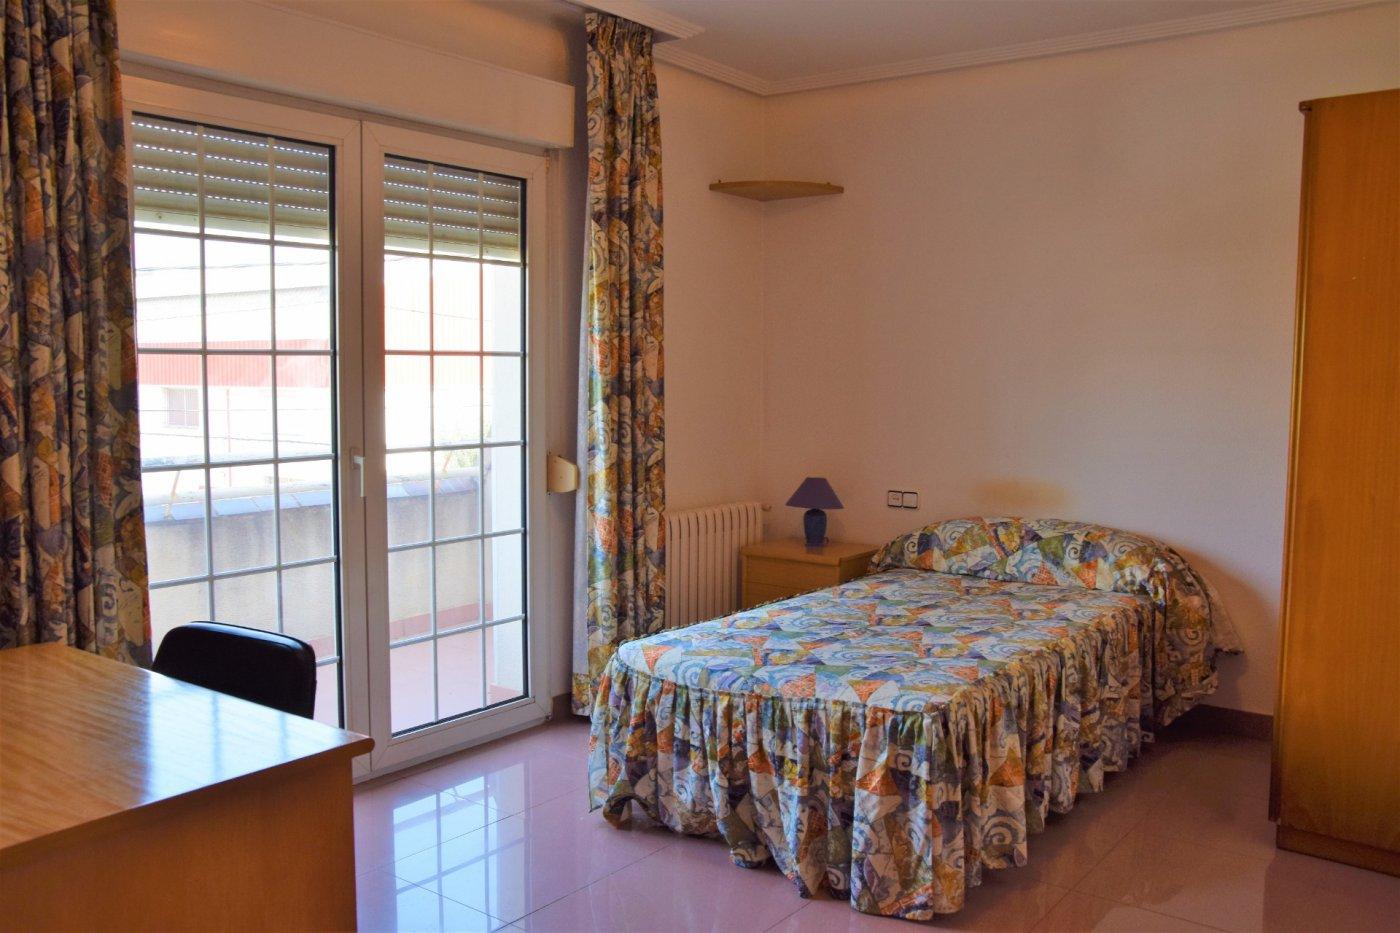 Chalet en Murcia www.joaquincarceles.com JC174 (33)